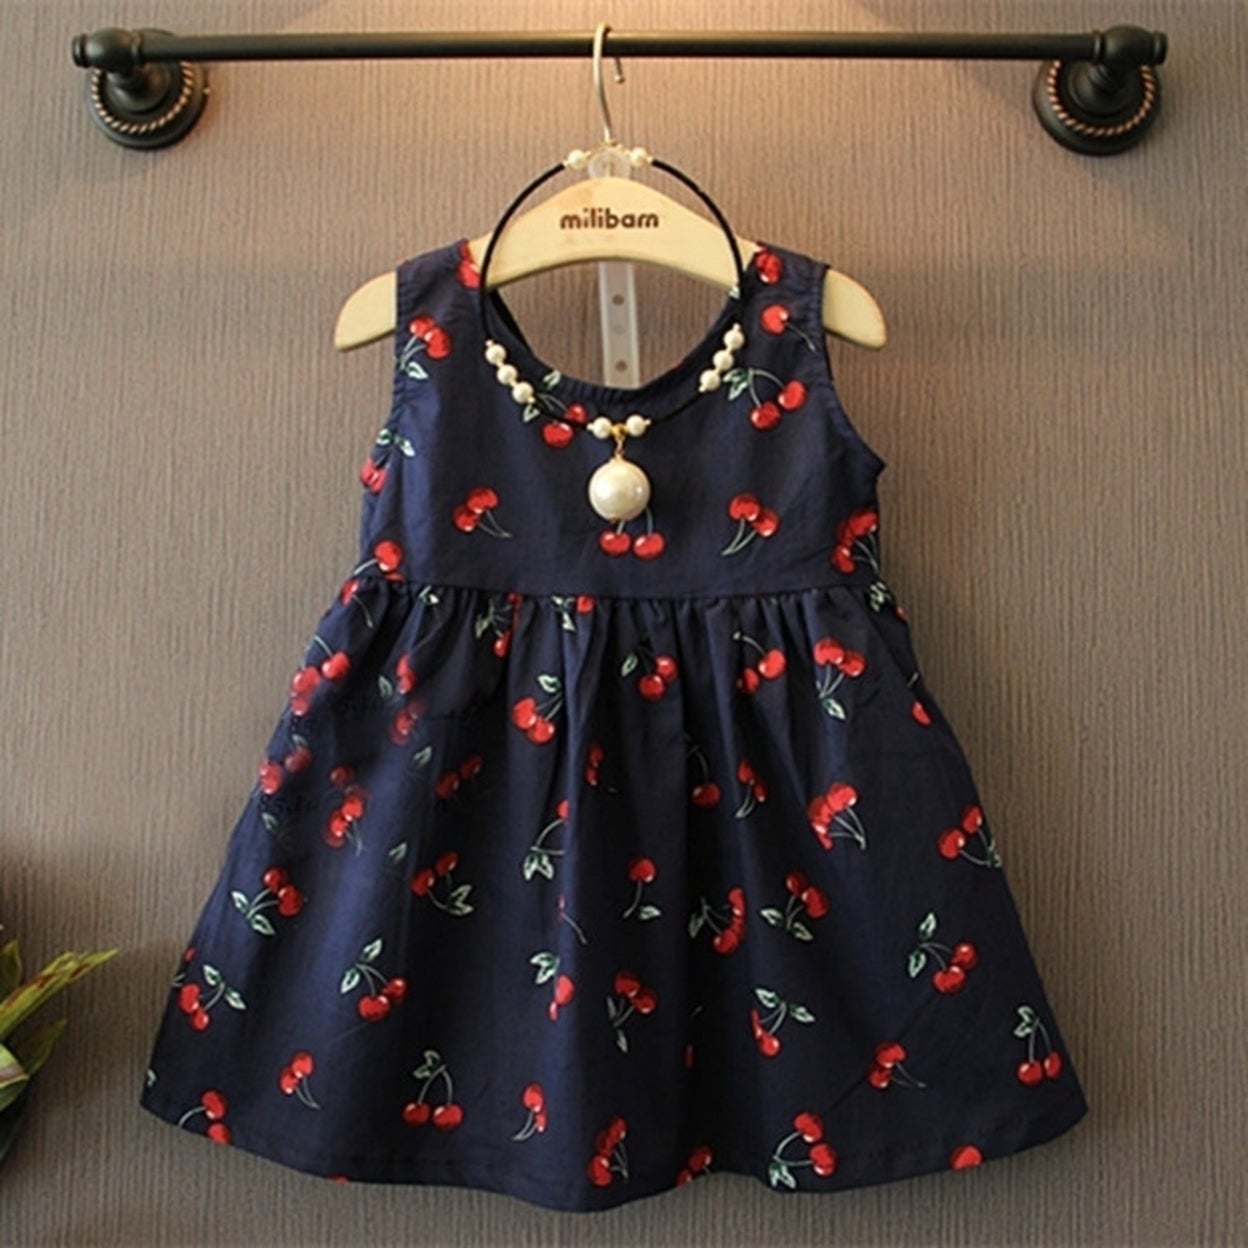 b99a03cd752 New baby girl fashion korean summer kids dresses casual cherry sleeveless  cute jpg 1248x1248 Baby dress